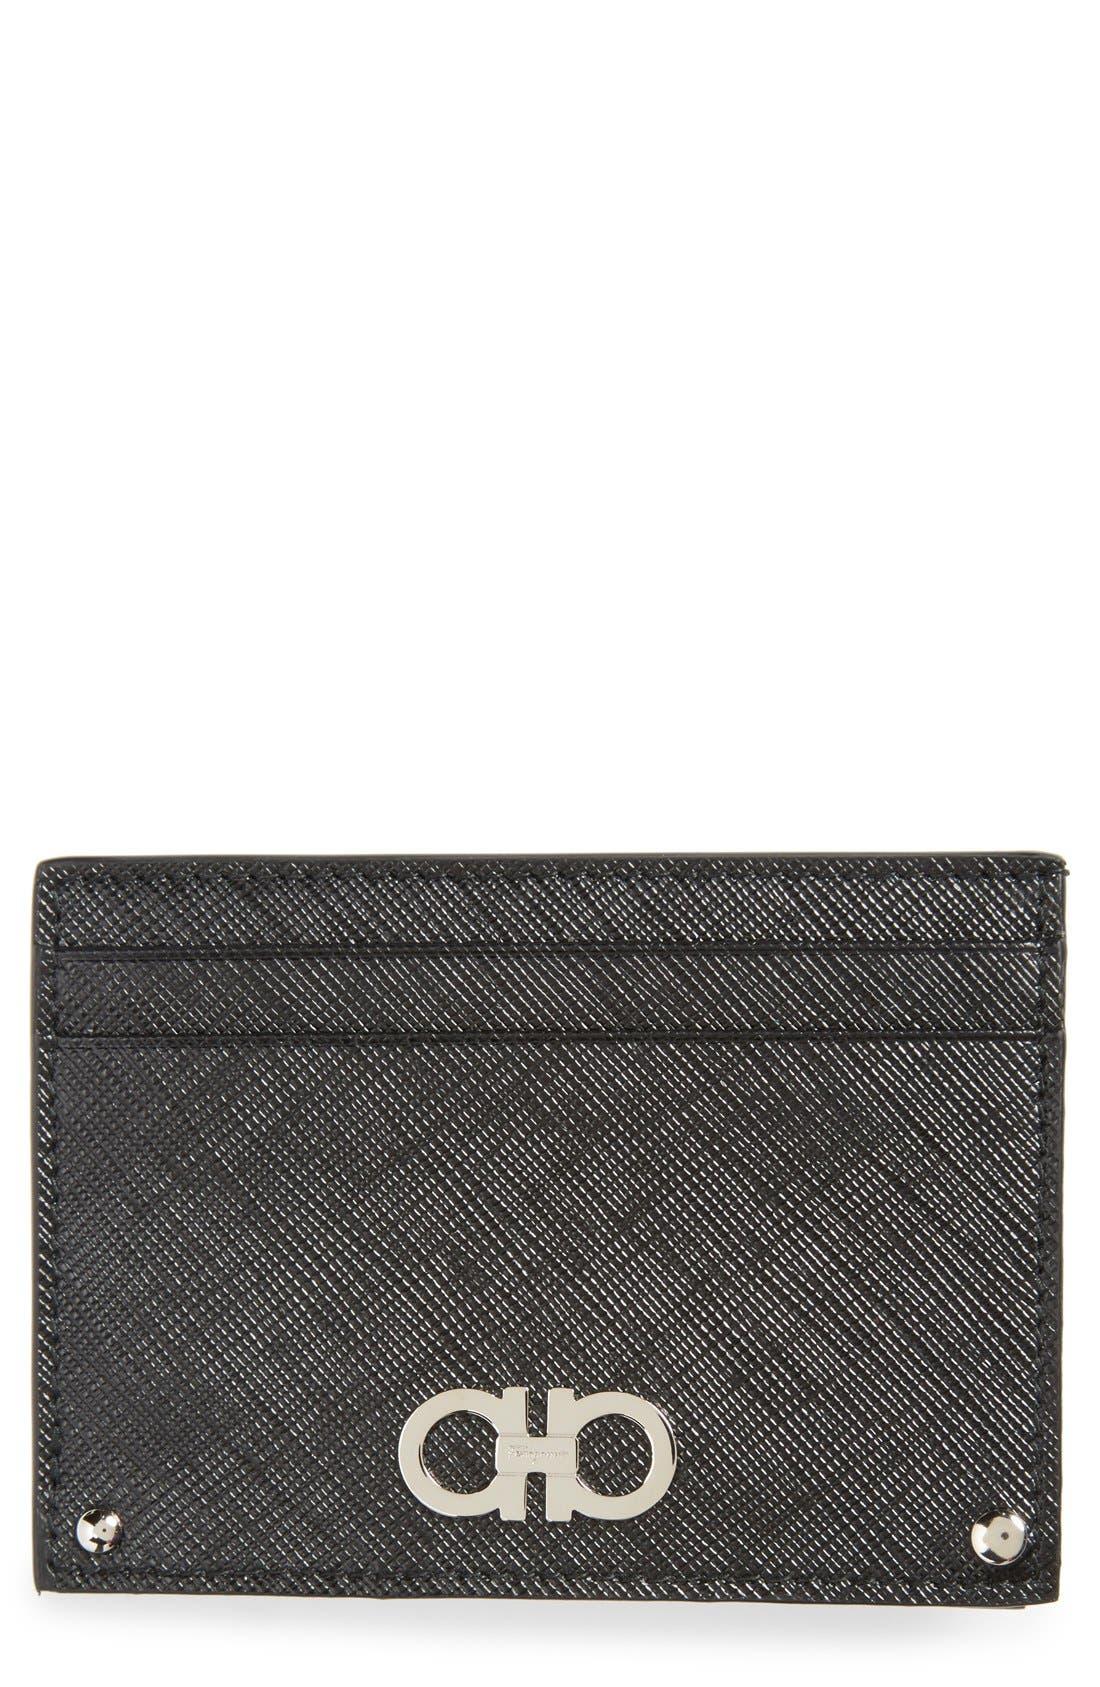 Saffiano Leather Card Case,                             Main thumbnail 1, color,                             001